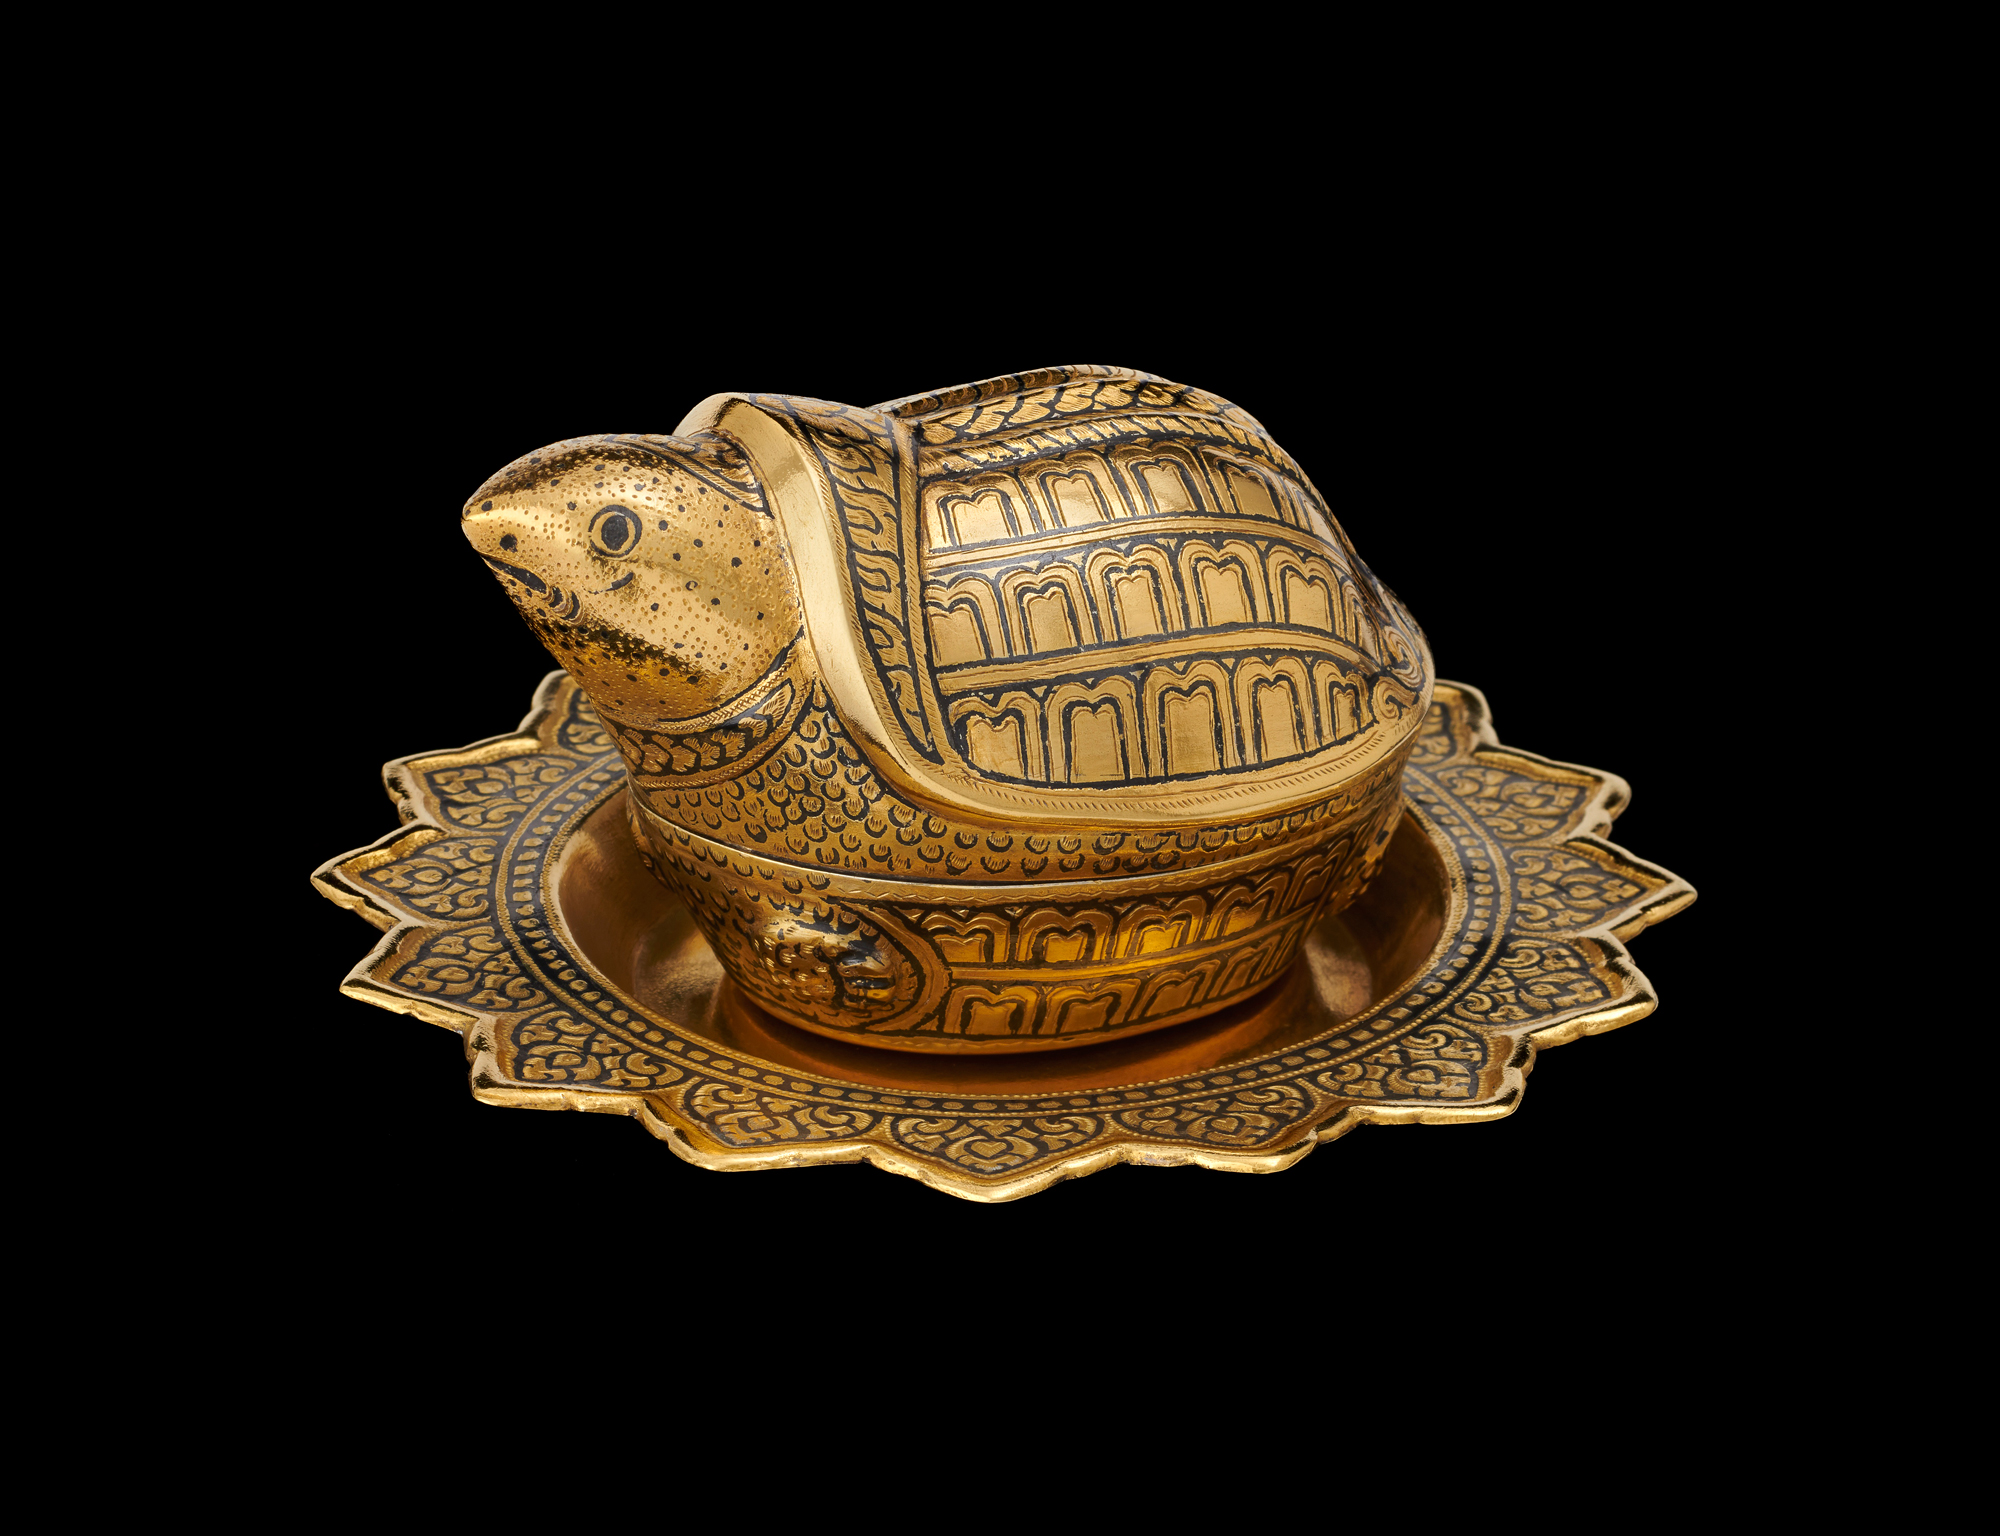 Gold Niello Turtle and Tray Gift from King Bhumibol Adulyadej to First Grandson Patrick Lyndon Nugent, 1967 6.35 x 6.53 cm Courtesy of the Lyndon B. Johnson Presidential Library and Museum; 1967.38.4 A-C  เต่าและพานถมทอง ของขวัญพระราชทานจากพระบาทสมเด็จพระปรมินทรมหาภูมิพลอดุลยเดช แก่แพทริค ลินดอน นูเจ็นท์ หลานชายประธานาธิบดีลินดอน บี. จอห์นสัน พ.ศ. ๒๕๑๐ ๖.๓๕ x ๖.๕๓ ซม. ได้รับความอนุเคราะห์จากพิพิธภัณฑ์และหอสมุดประธานาธิบดีลินดอน บี. จอห์นสัน; 1967.38.4 A-C